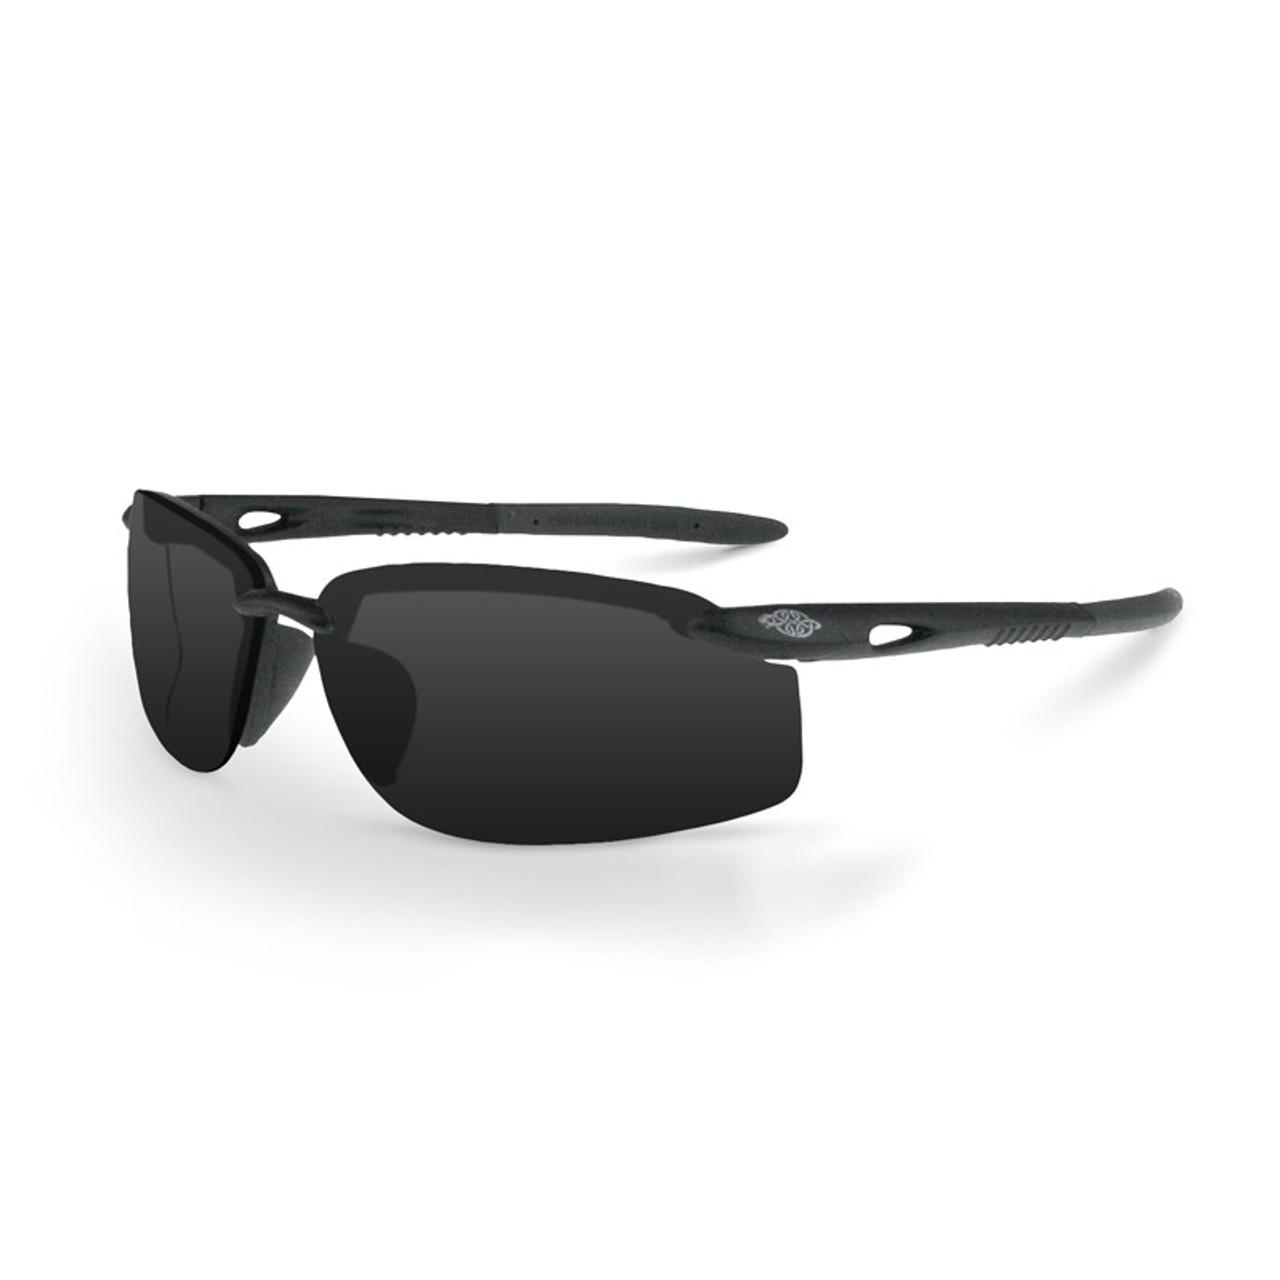 4bb4dc3381 Crossfire ES5W 1241W Safety Glasses - Smoke Lens - Box of 12 - ES5W-1241W